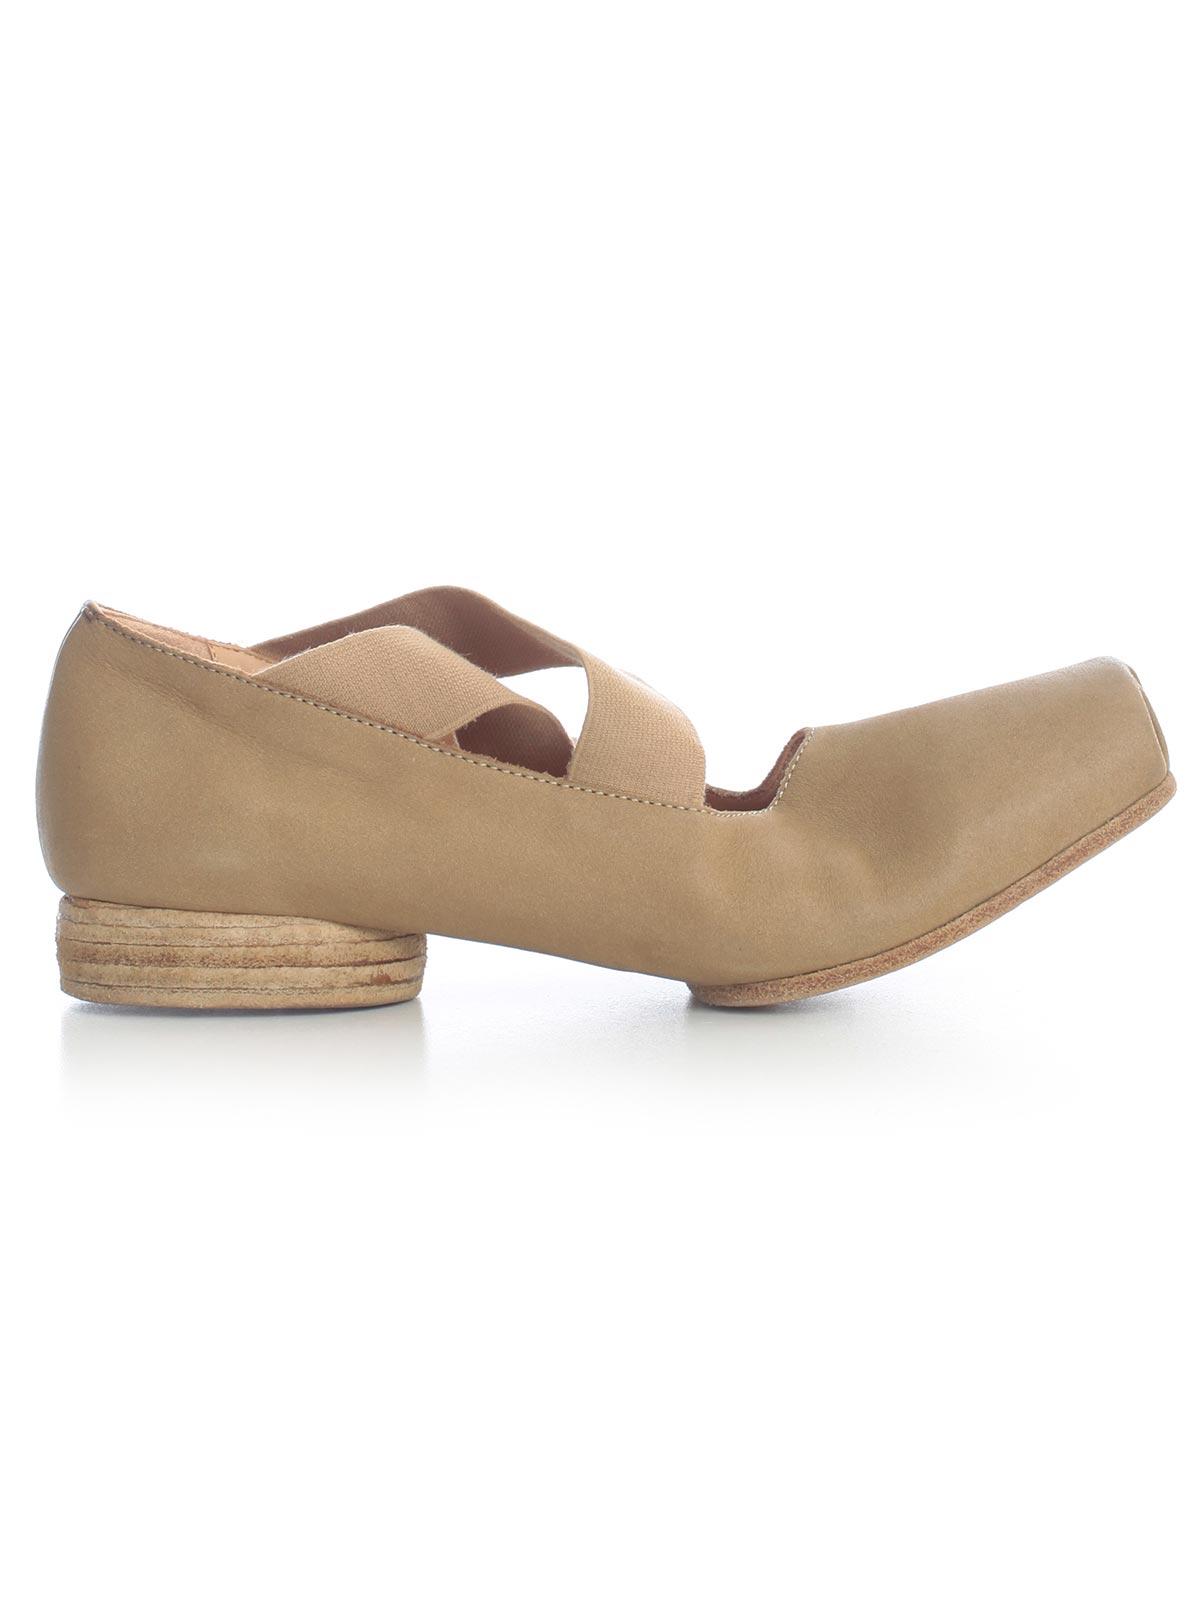 Uma Wang Shoes US9004.I92P0 - UW200 TAN